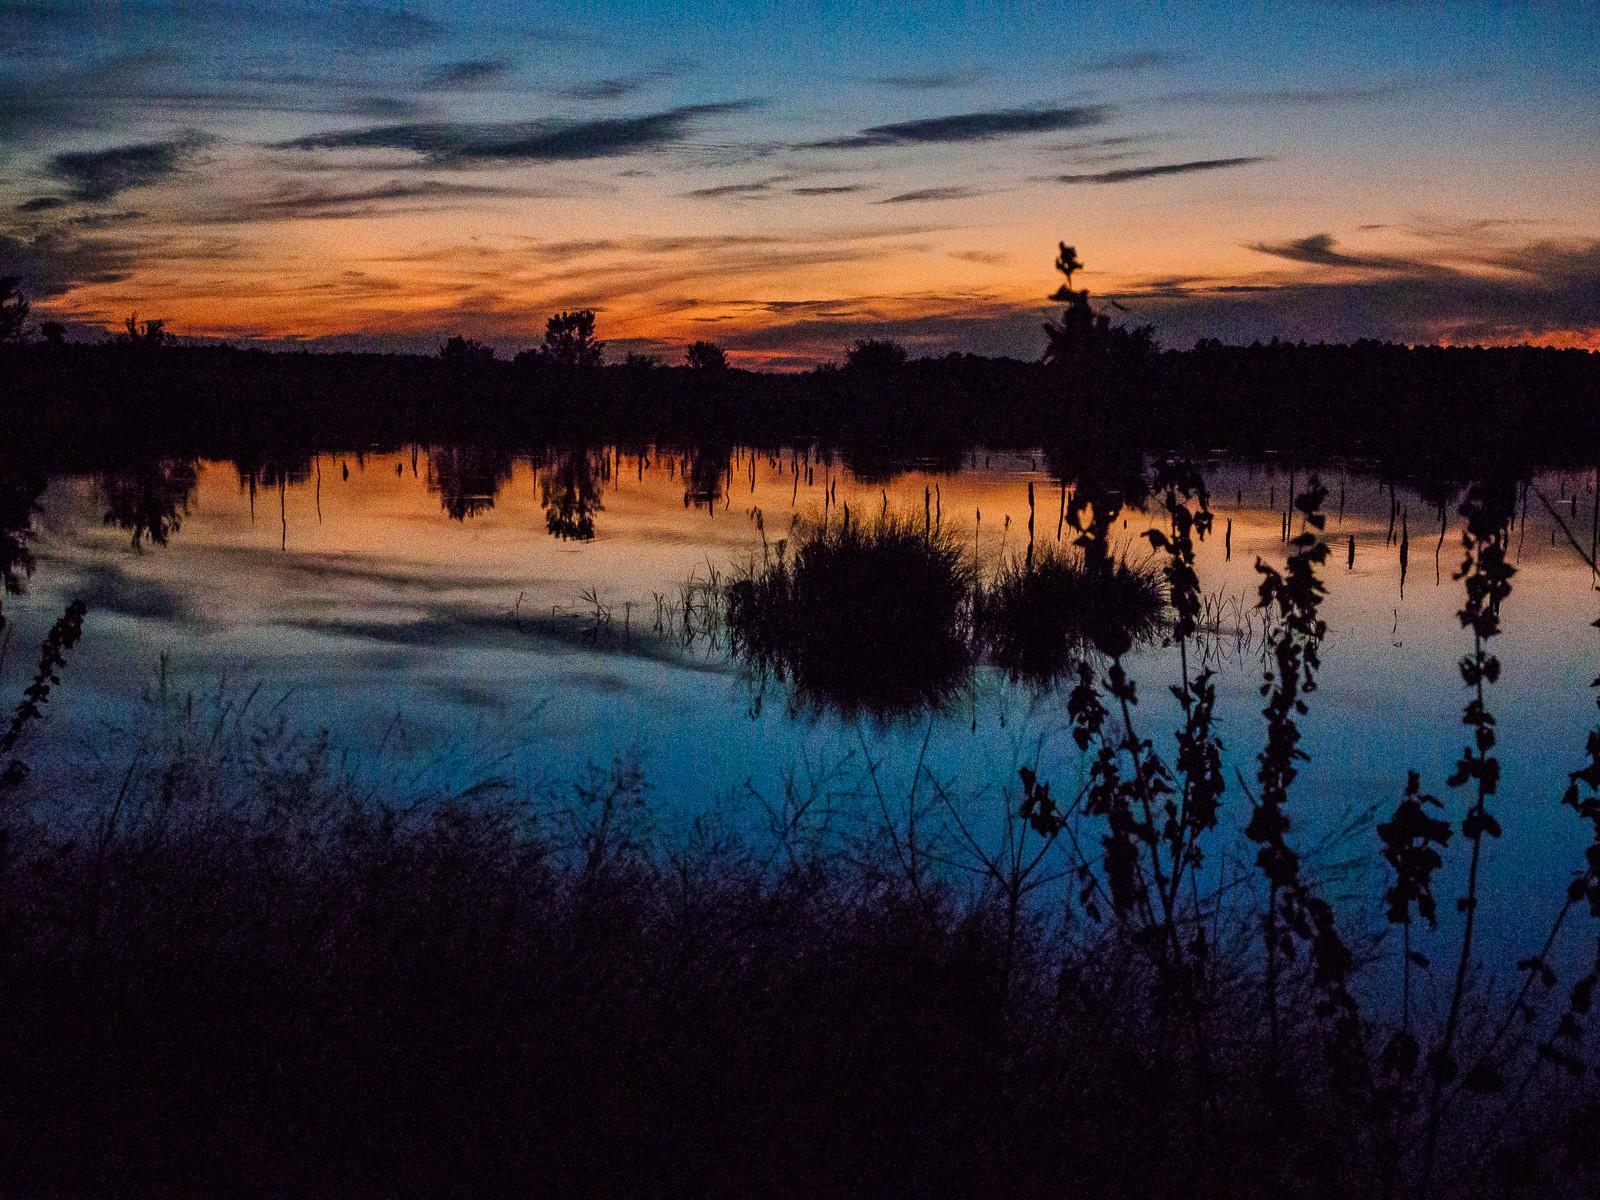 sunset-6654